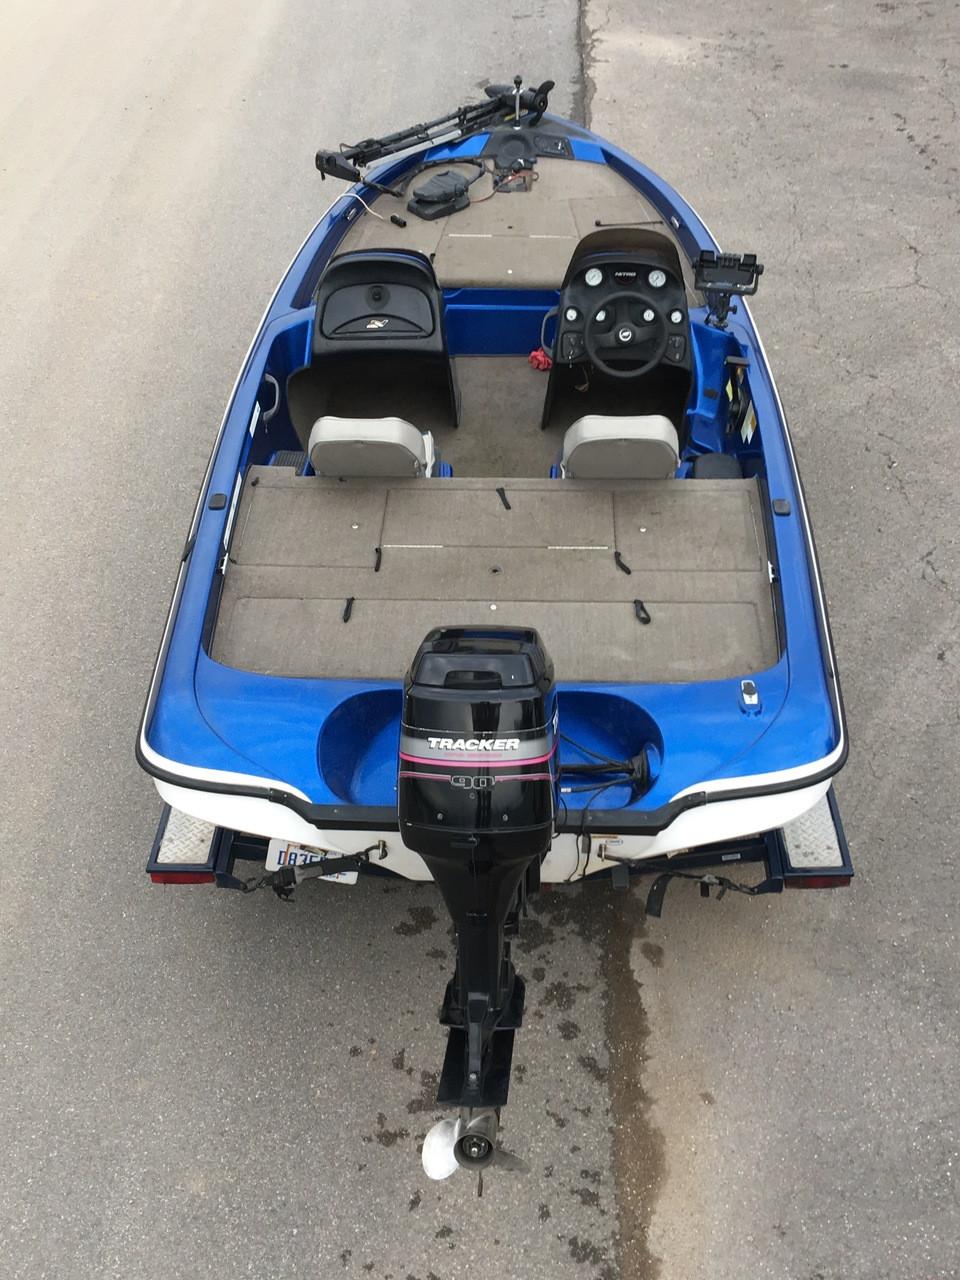 2003 Tracker Nitro NX750 17' Bass Boat w/Mercury 90 HP Motor and Trailer